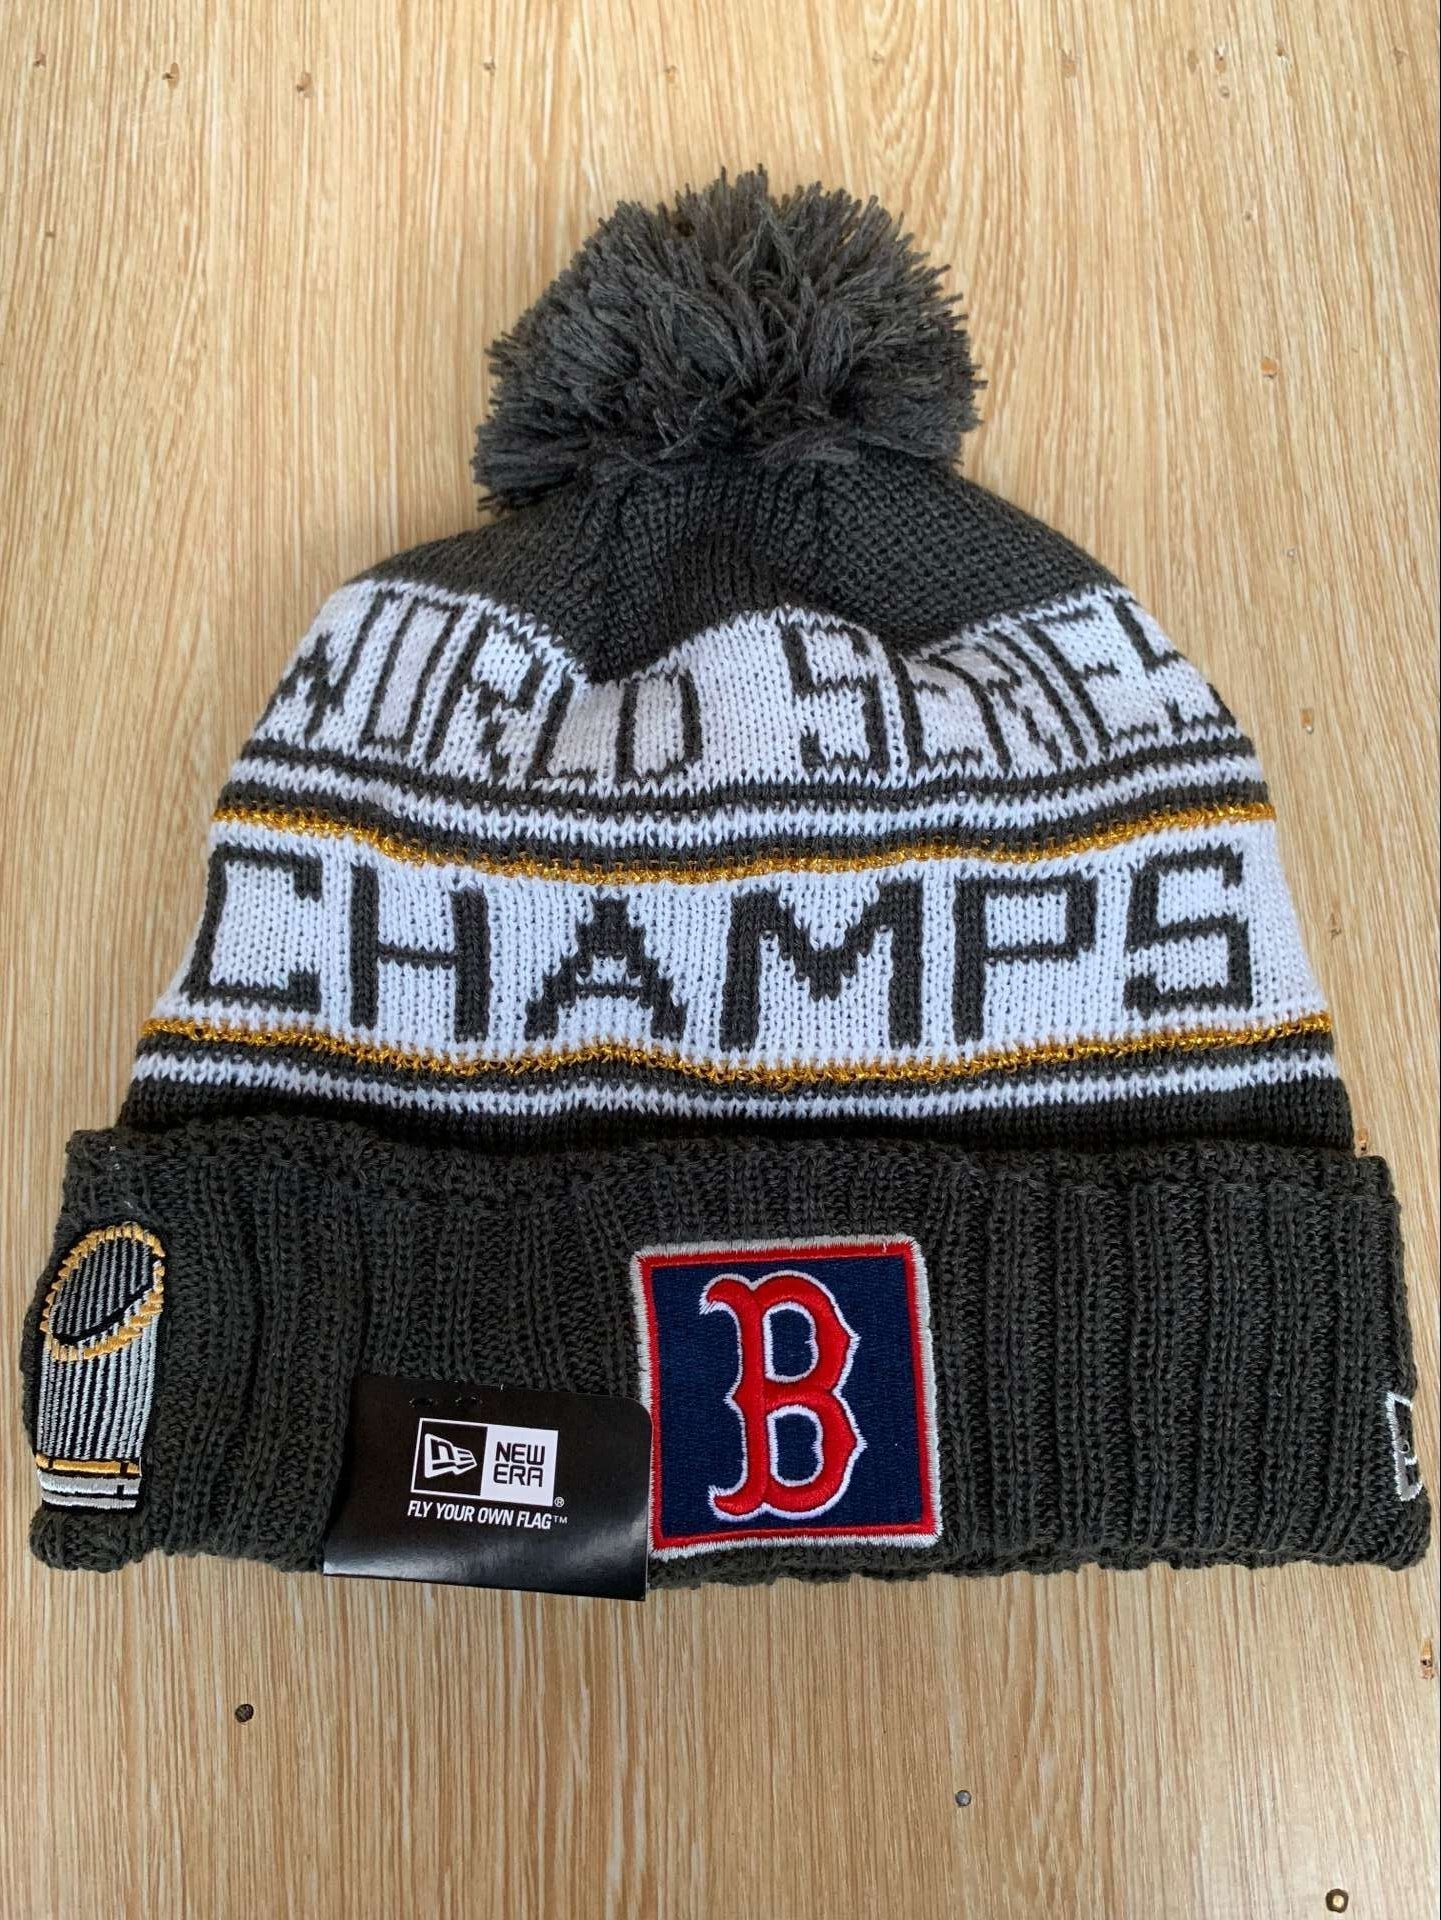 Red Sox 2018 World Series Champions Pom Knit Hat YD